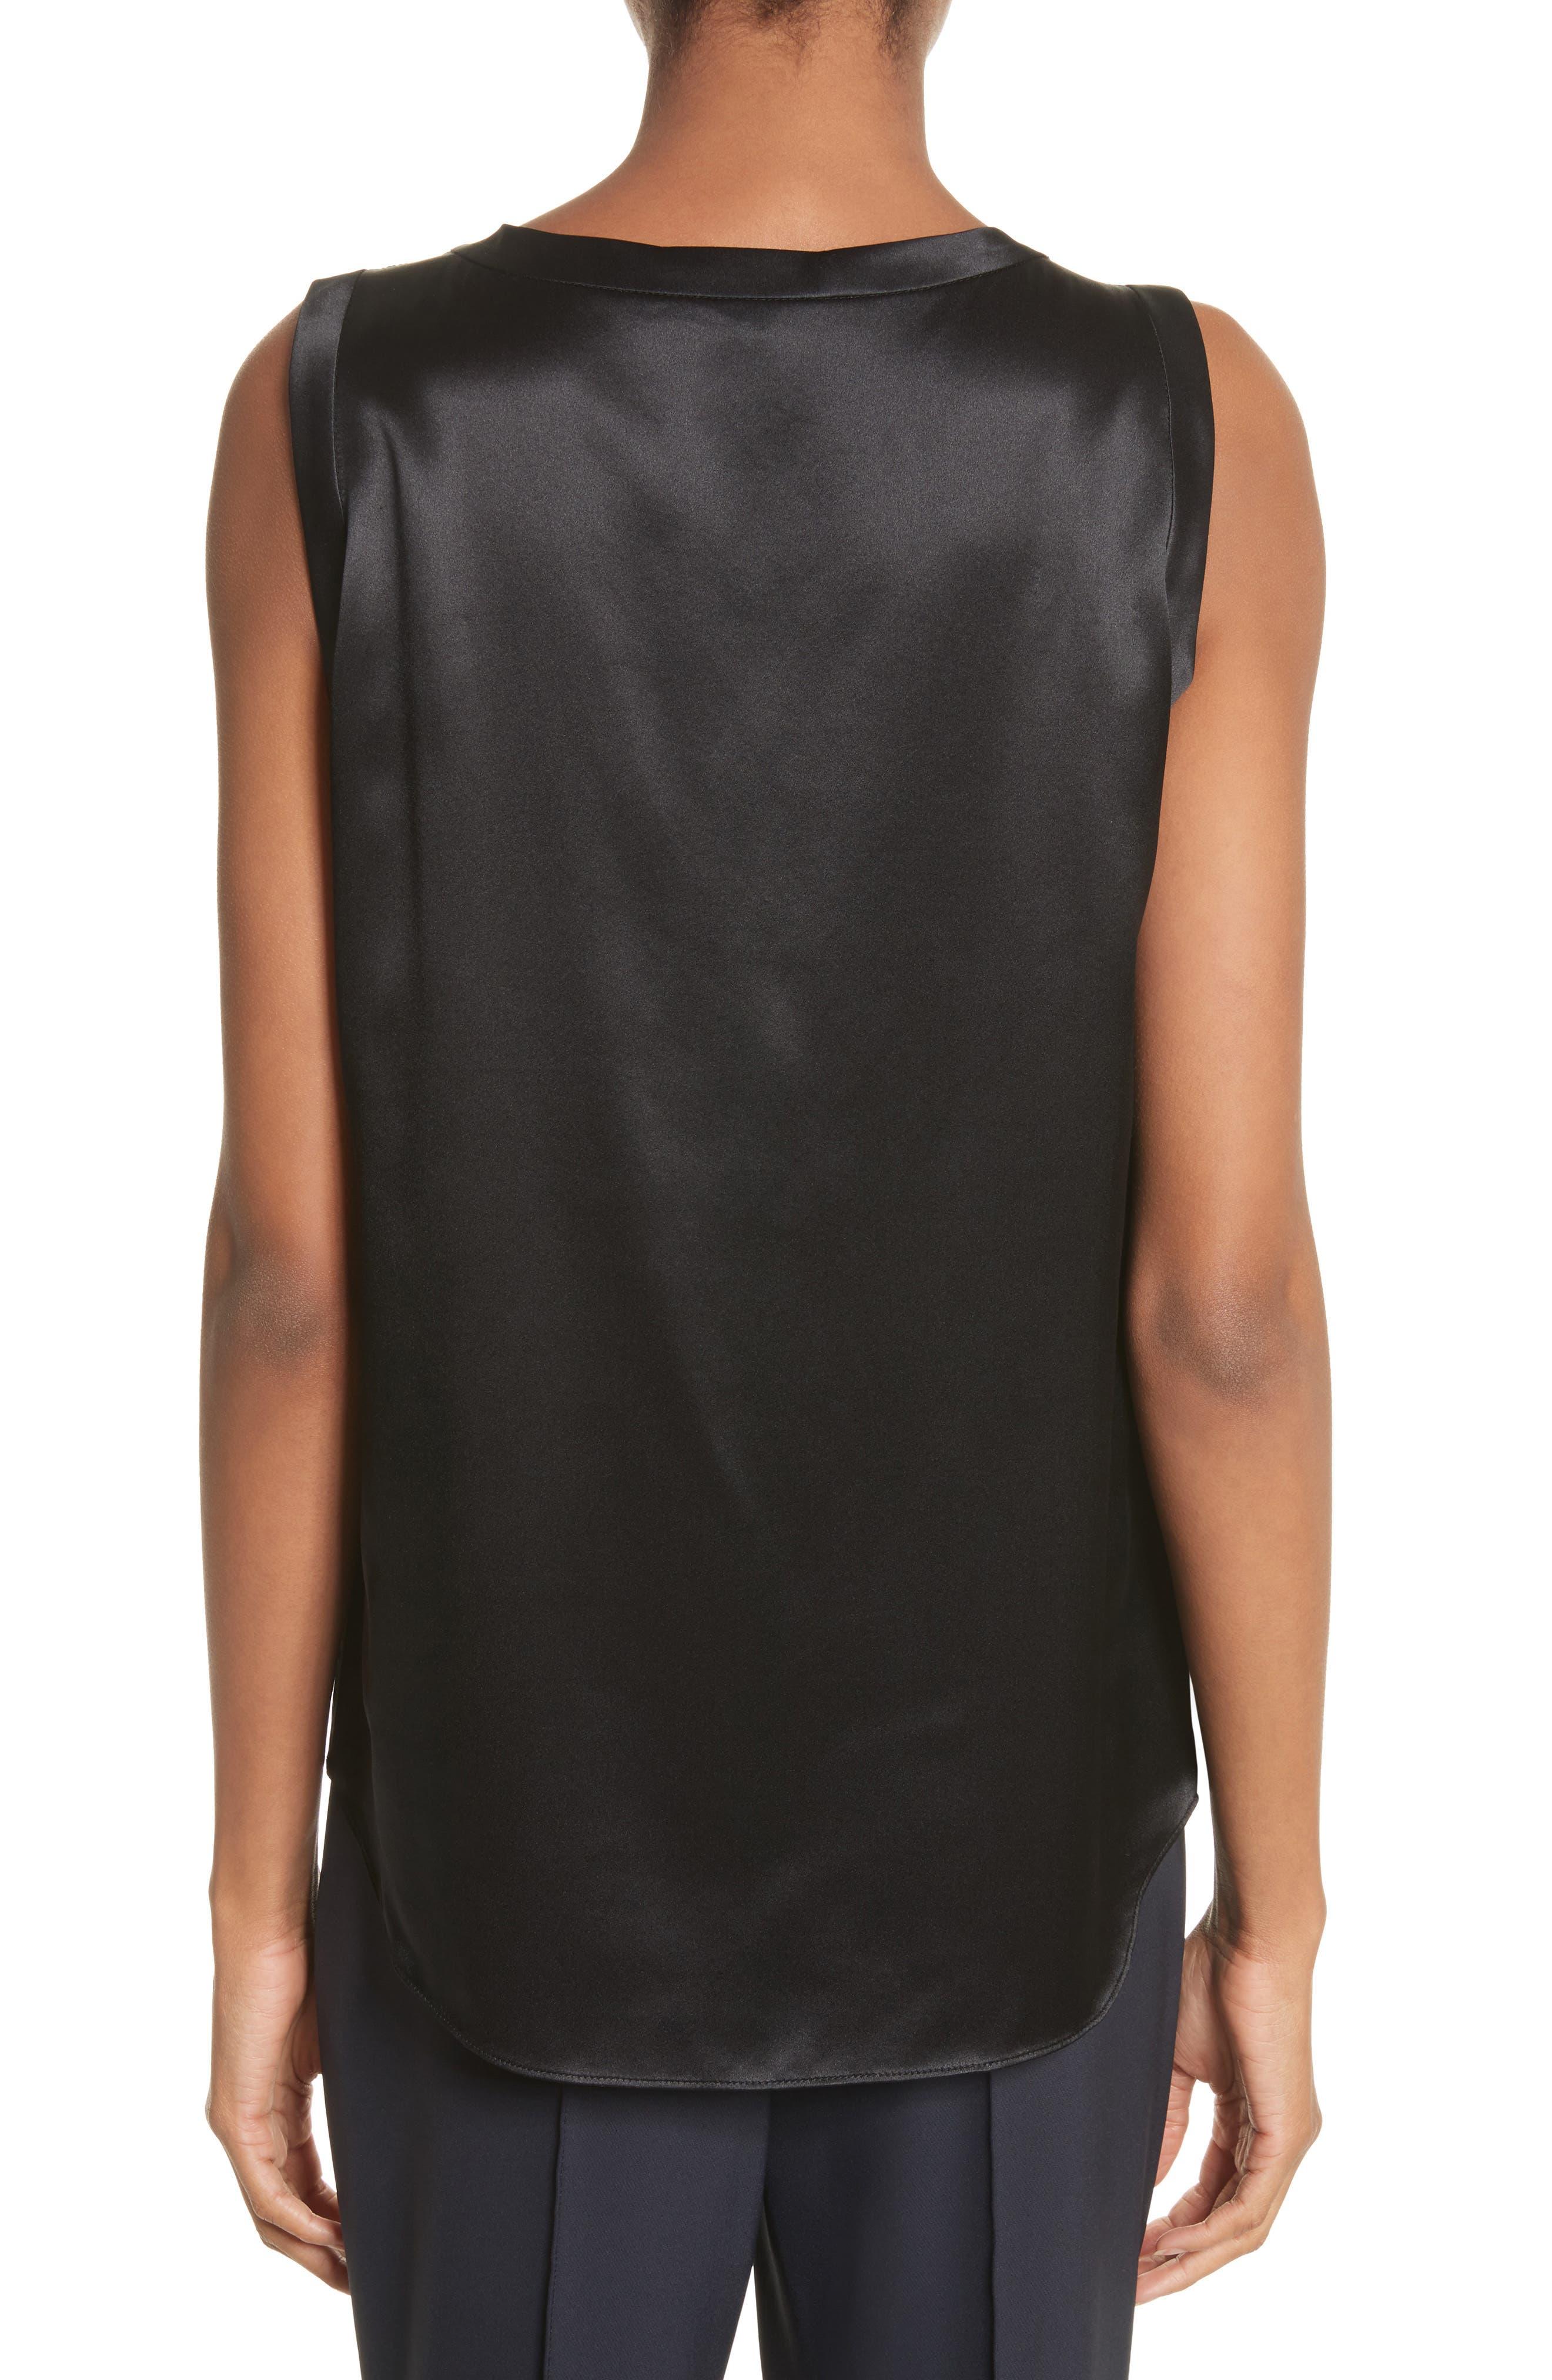 LAFAYETTE 148 NEW YORK, Perla Reversible Silk Blouse, Alternate thumbnail 2, color, BLACK